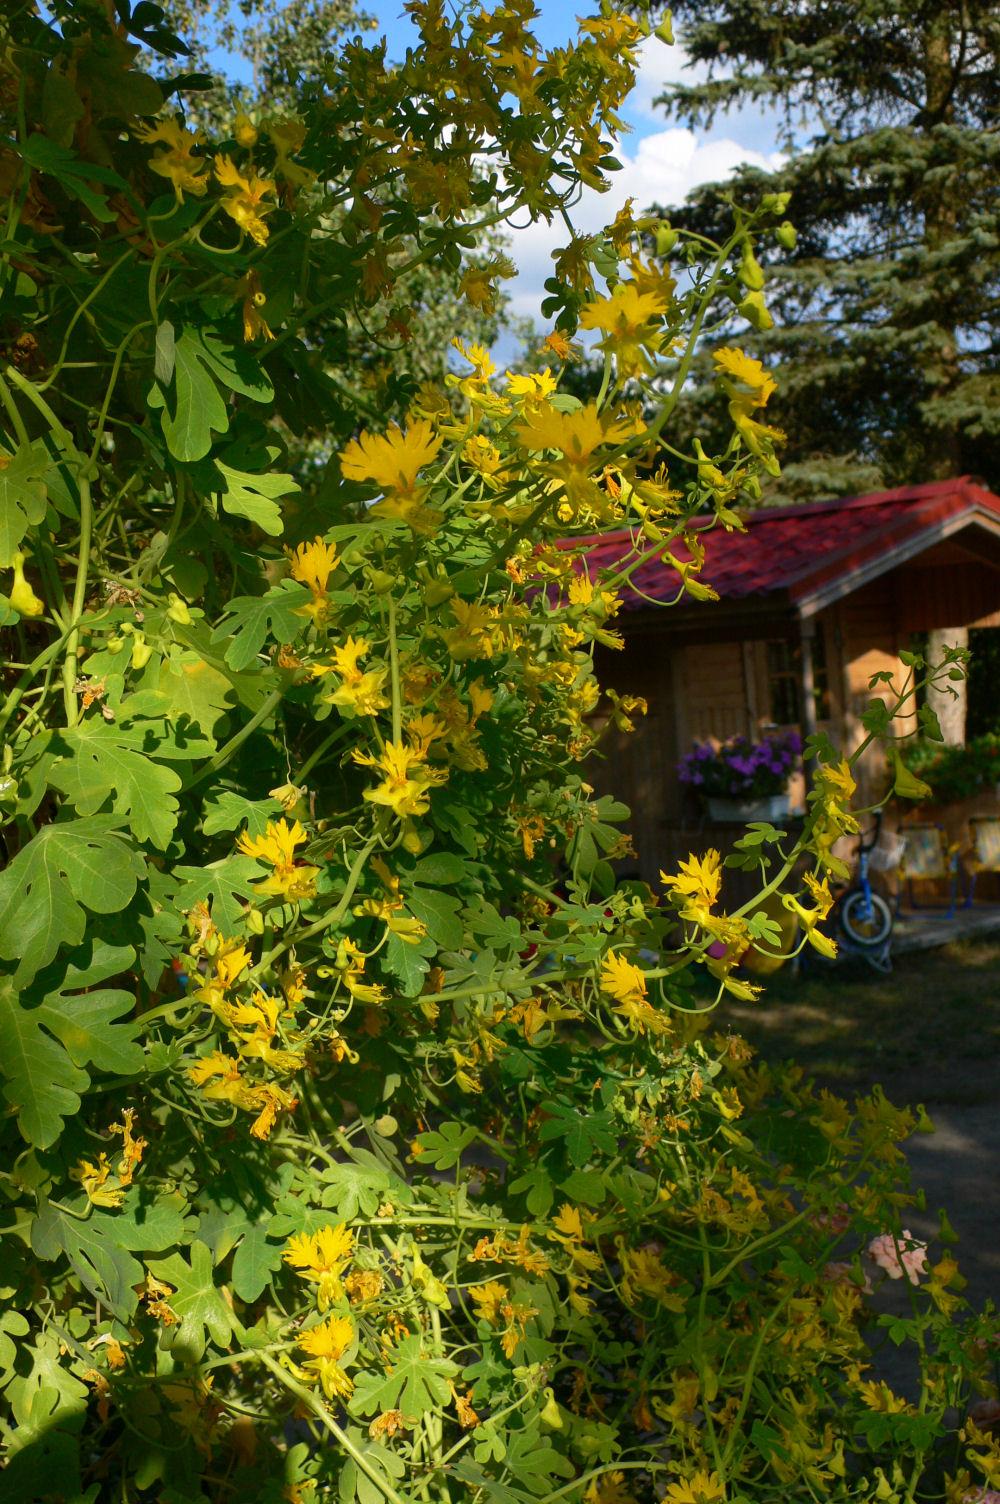 adelaparvu.com top 5 plante cataratoare, Text Carli Marian, In foto Tropaeolum Peregrinum (4)